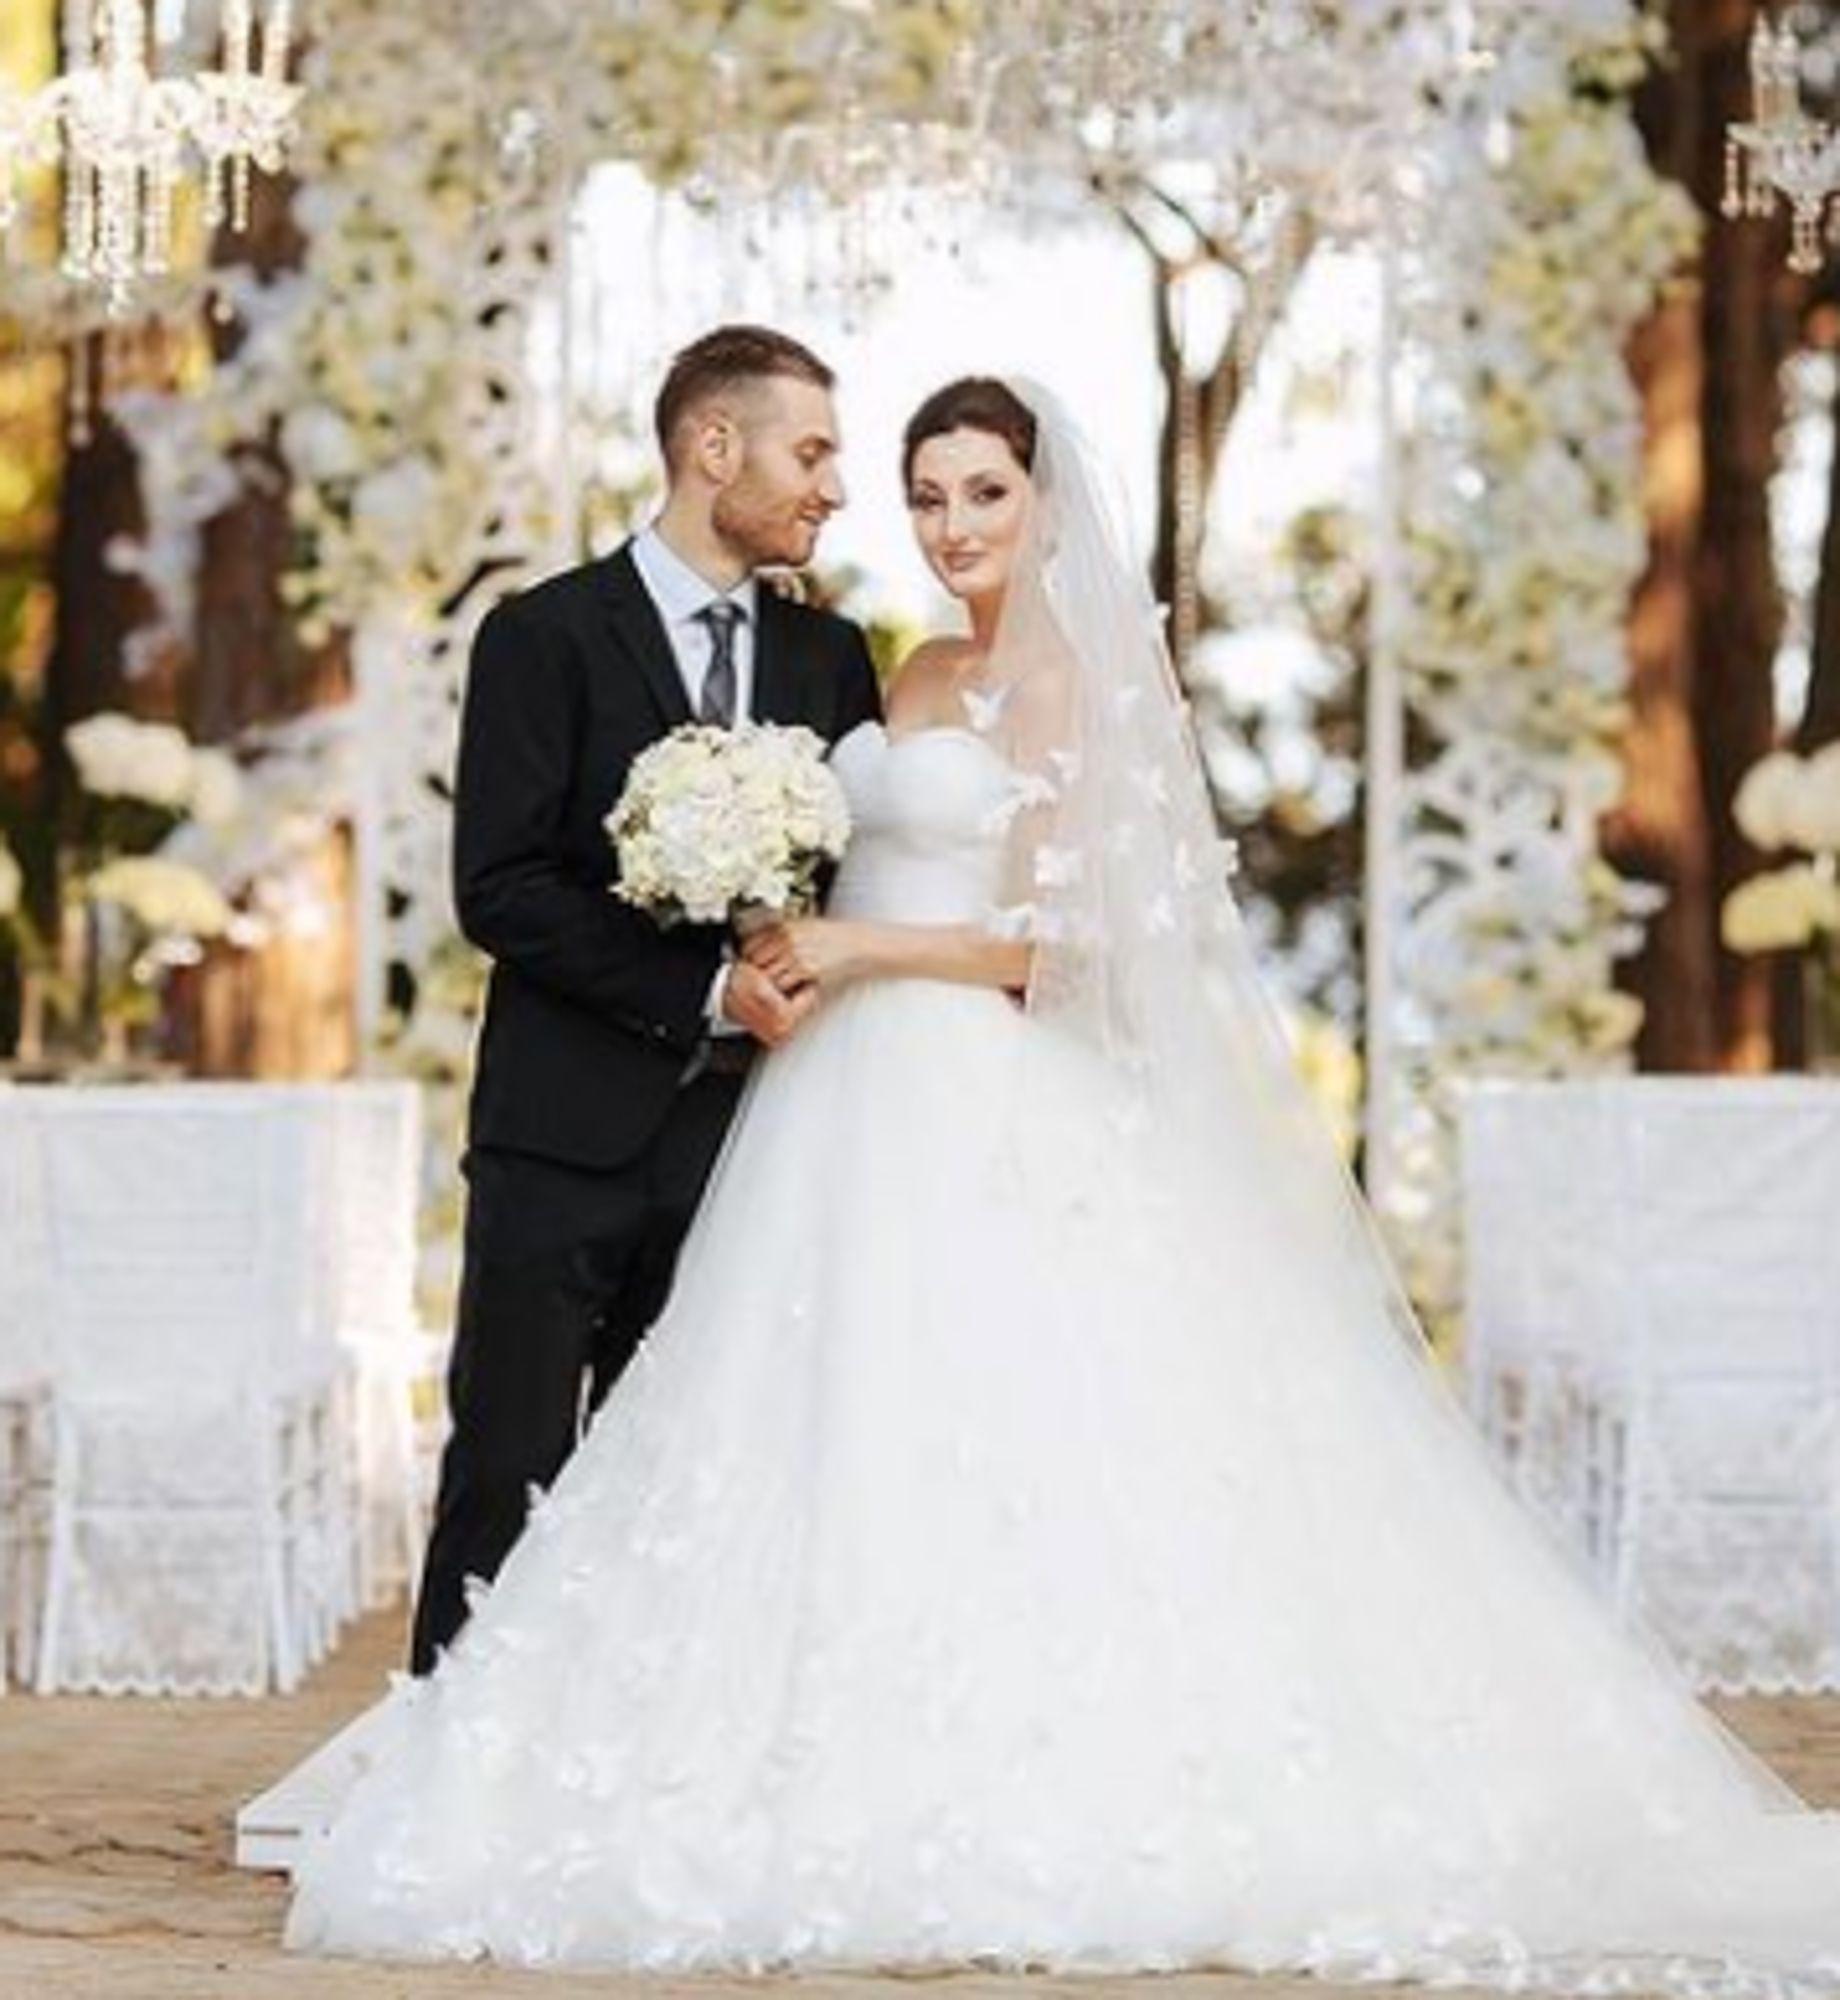 Wedding Planner Bogotá Lo Que Debes Saber Del Organizador De Eventos Planificadores De Bodas Decoracion Matrimonio Bodas Sencillas